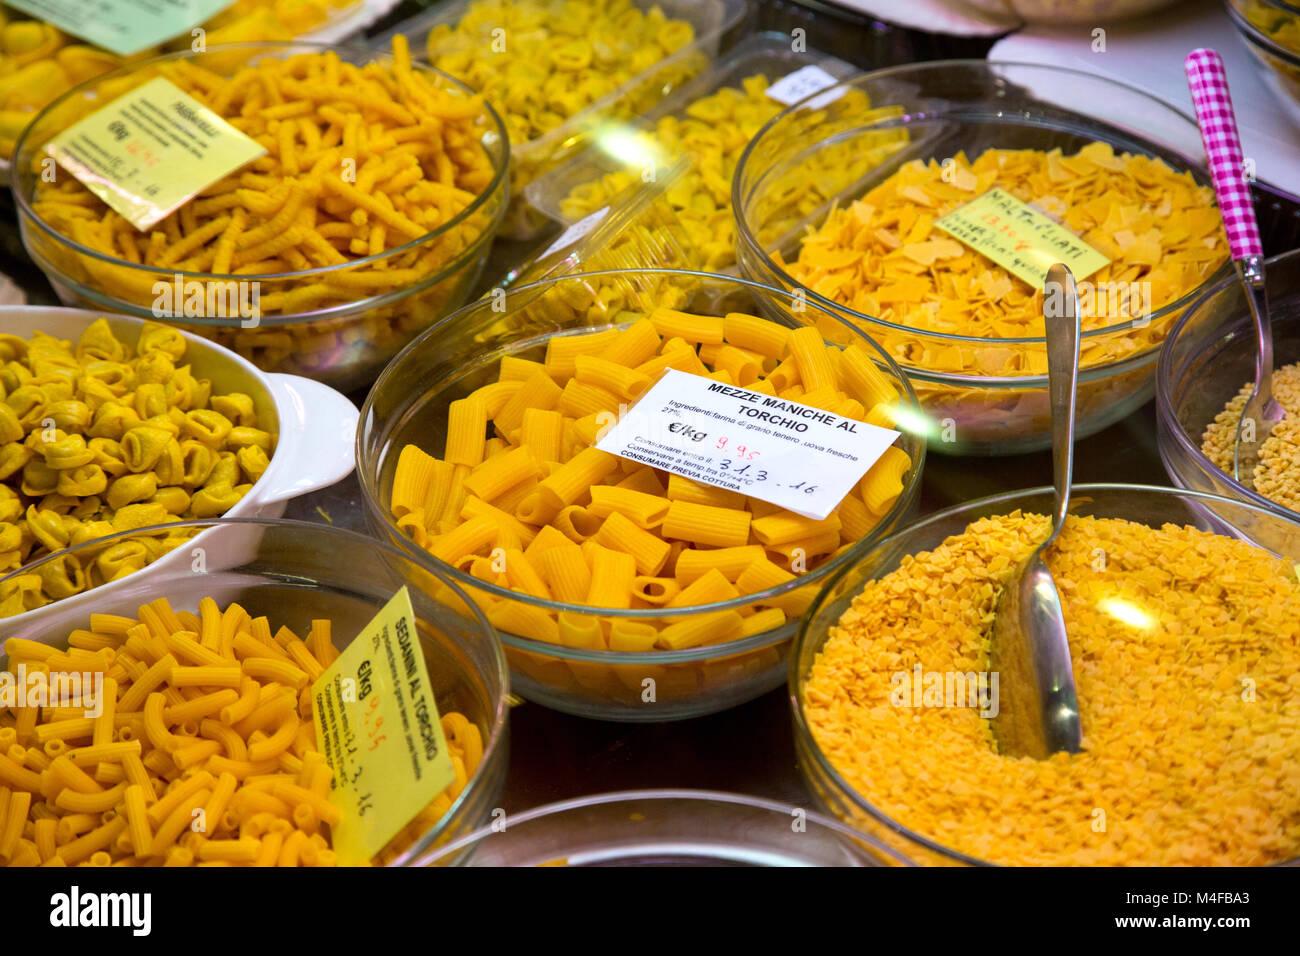 Pasta in Mercato Albinelli in Modena Italy - Stock Image